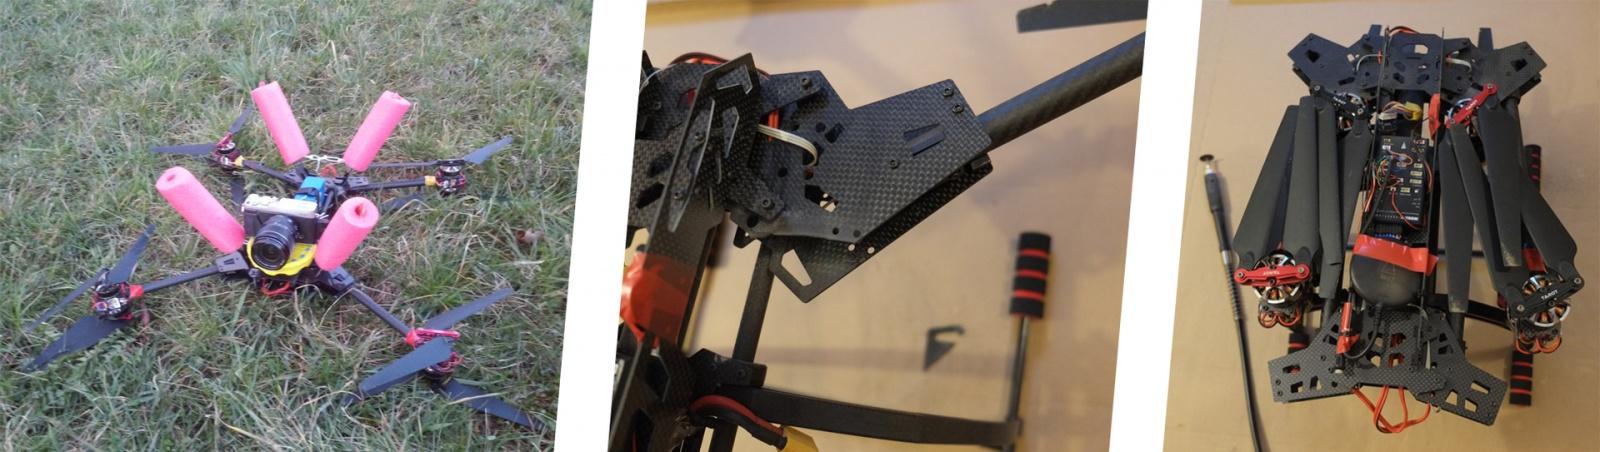 Коптер в рюкзаке — сборка по мотивам рамы Predator 650 - 4